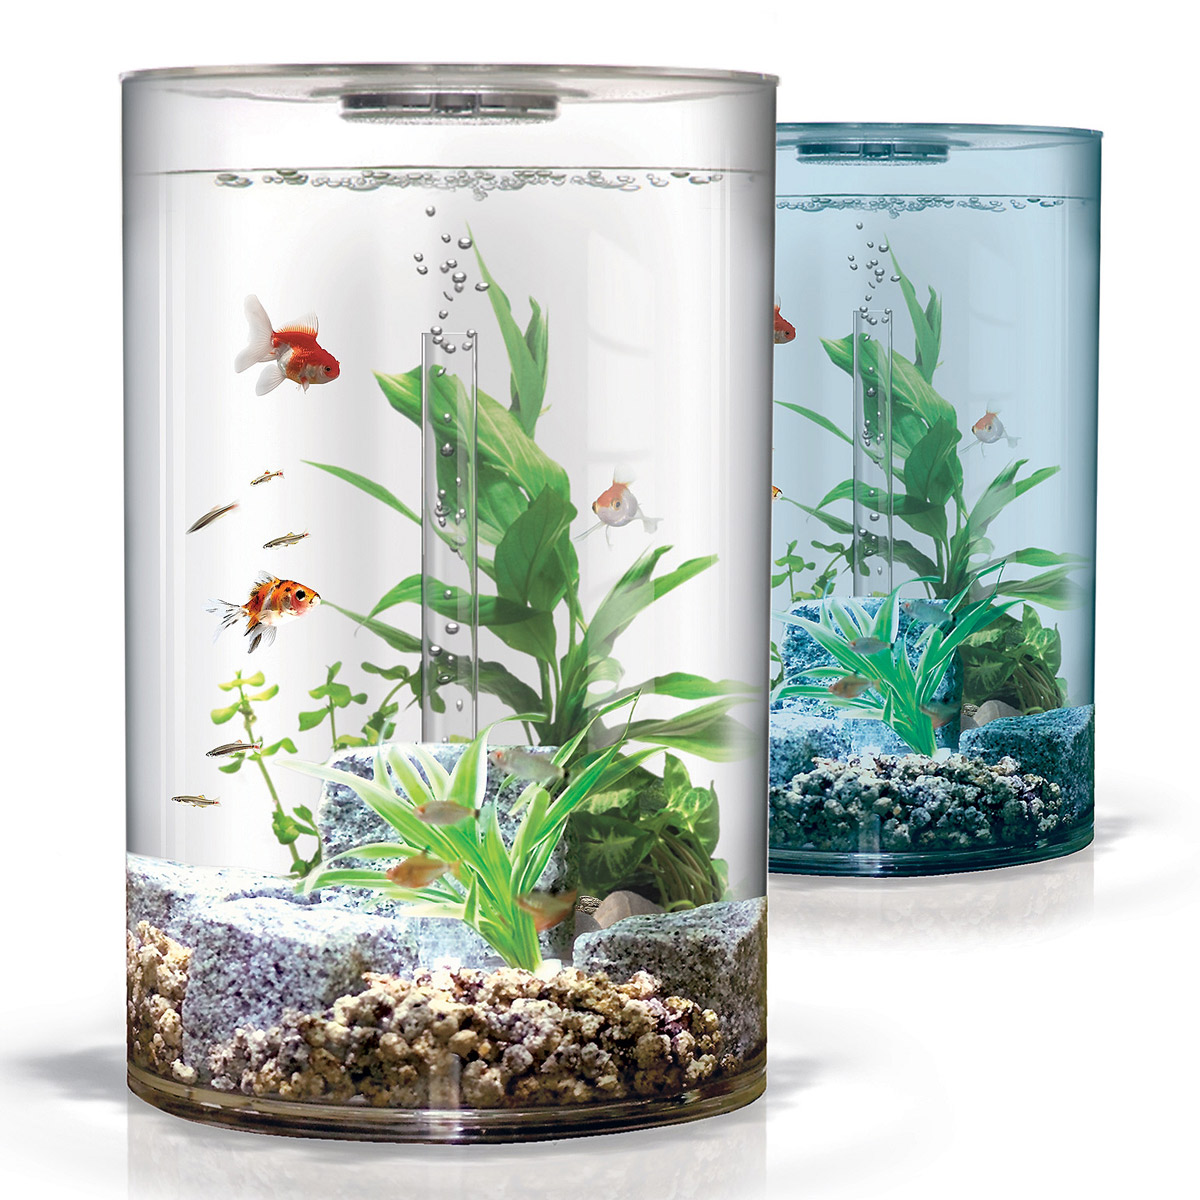 Тренд: аквариум в интерьере - фото №1